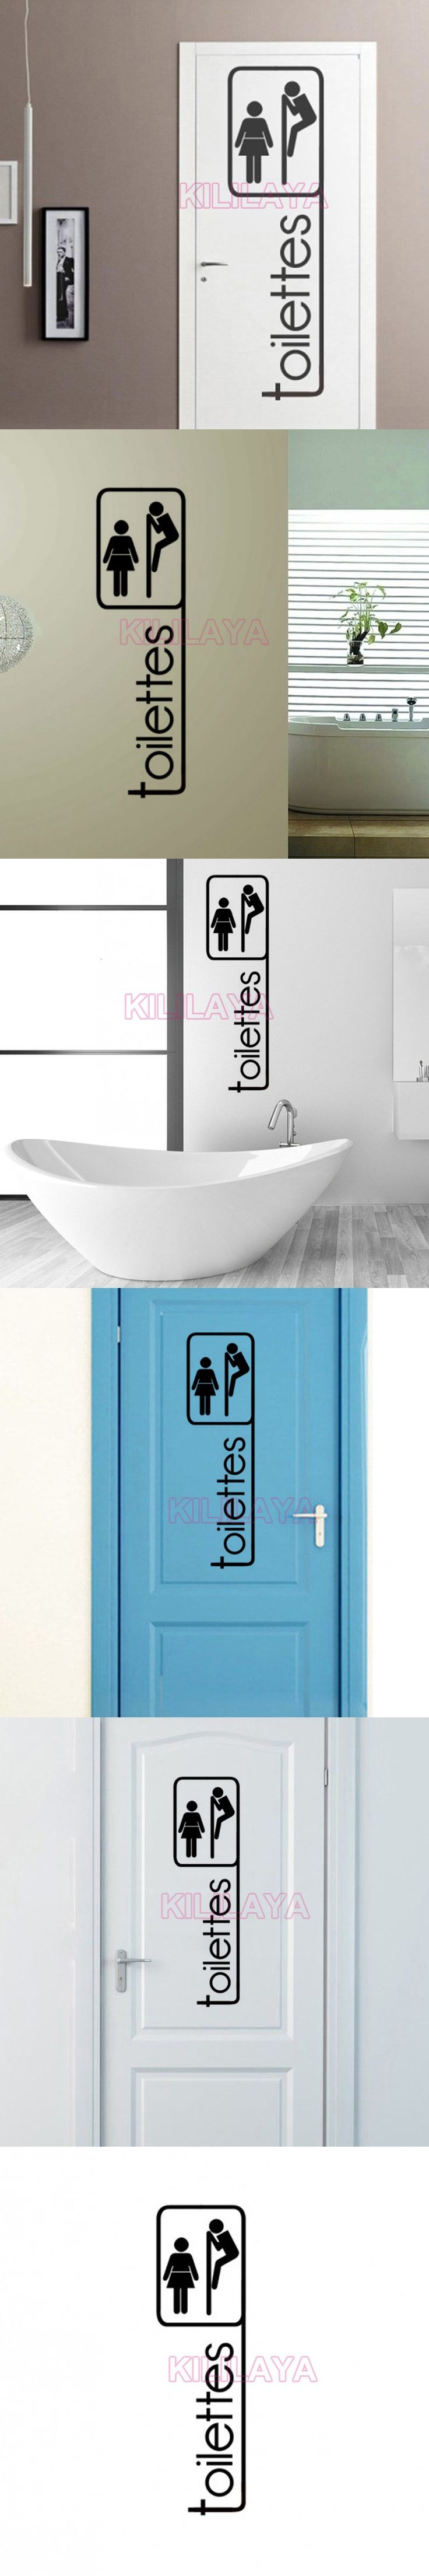 Stickers Salle De Bain Ideas Onstickers